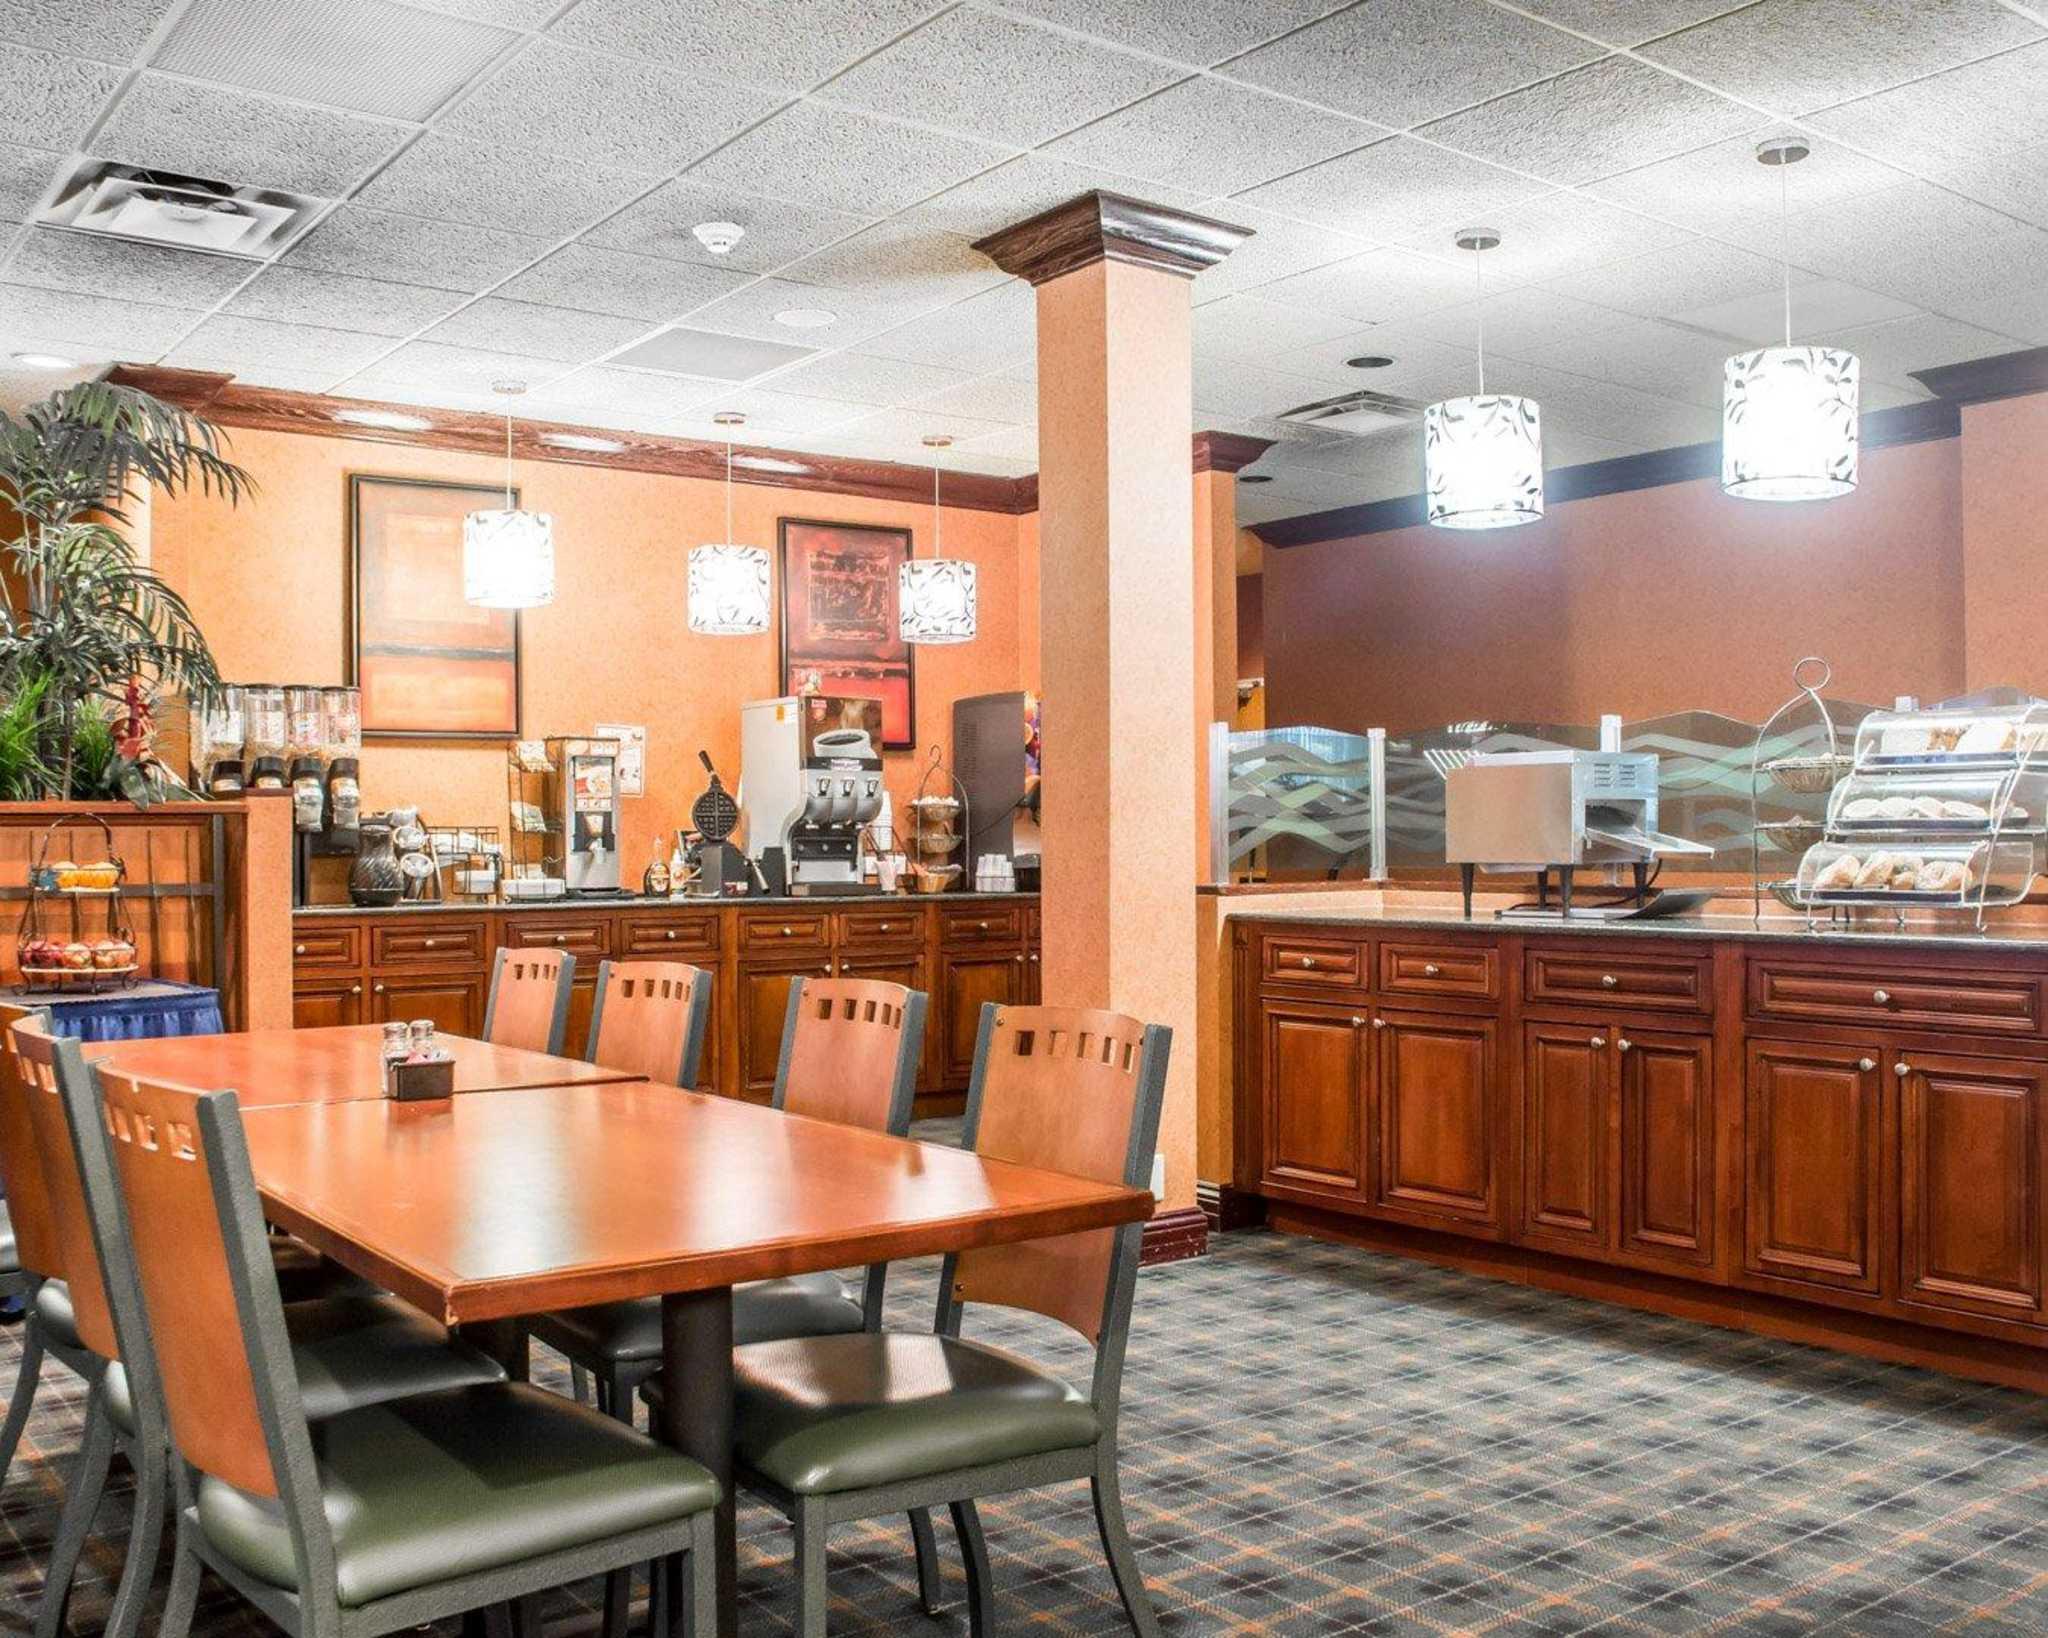 Quality Inn & Suites Fairgrounds image 12